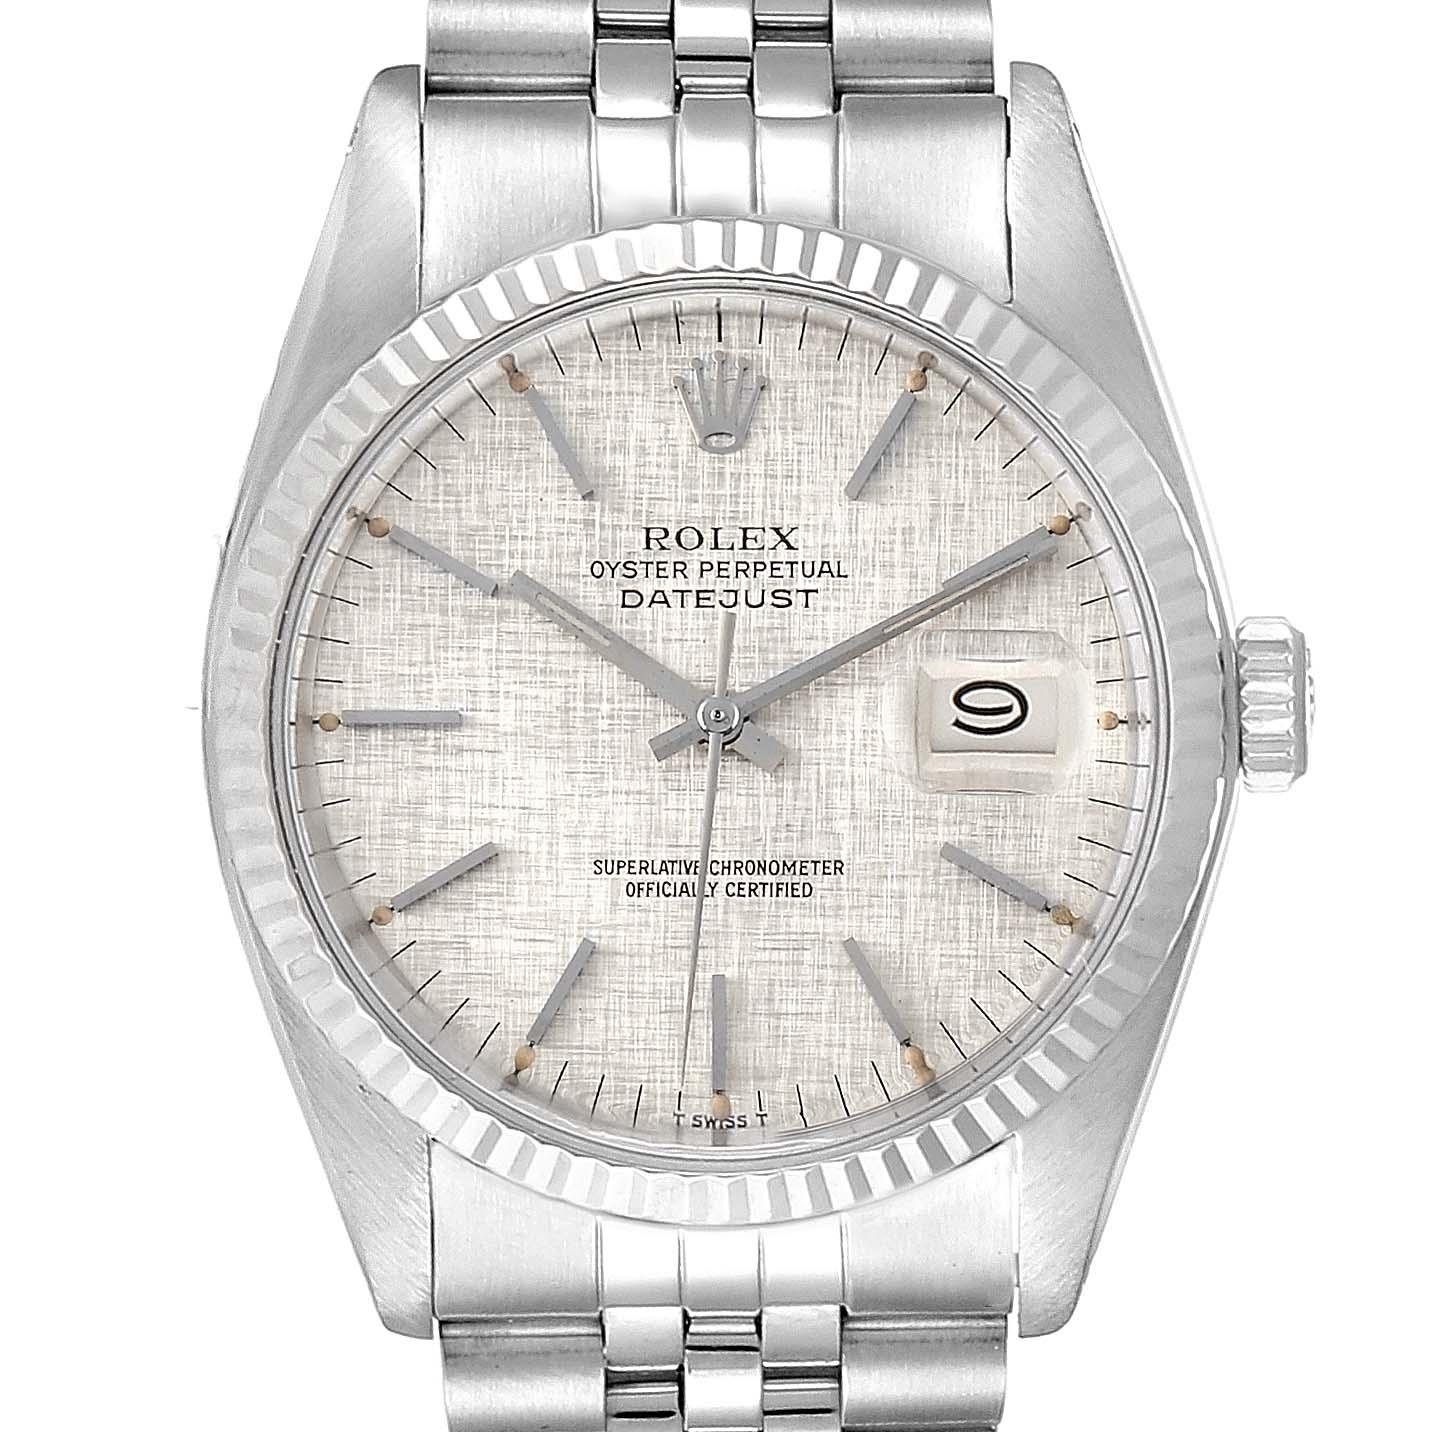 Rolex Datejust Linen Dial Steel White Gold Vintage Mens Watch 16014